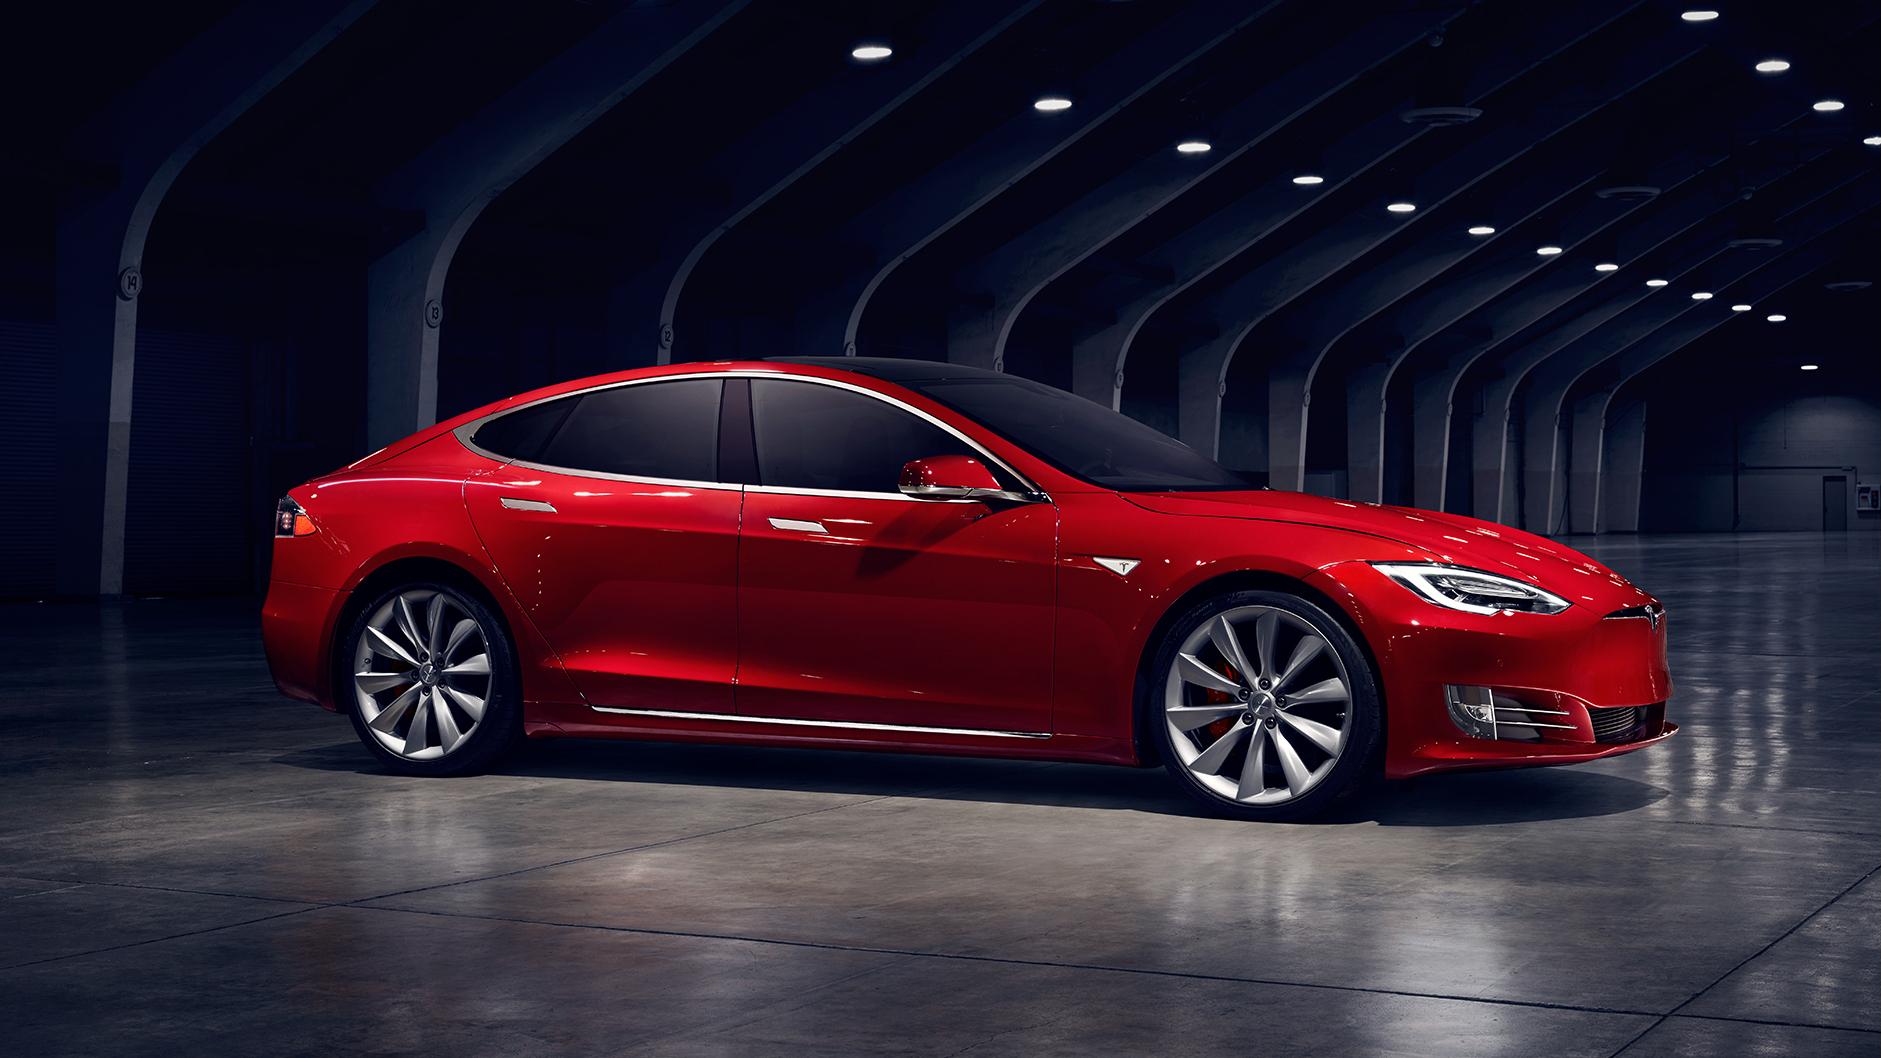 Tesla bringt mit Model S 60 neue Basisversion, erneut